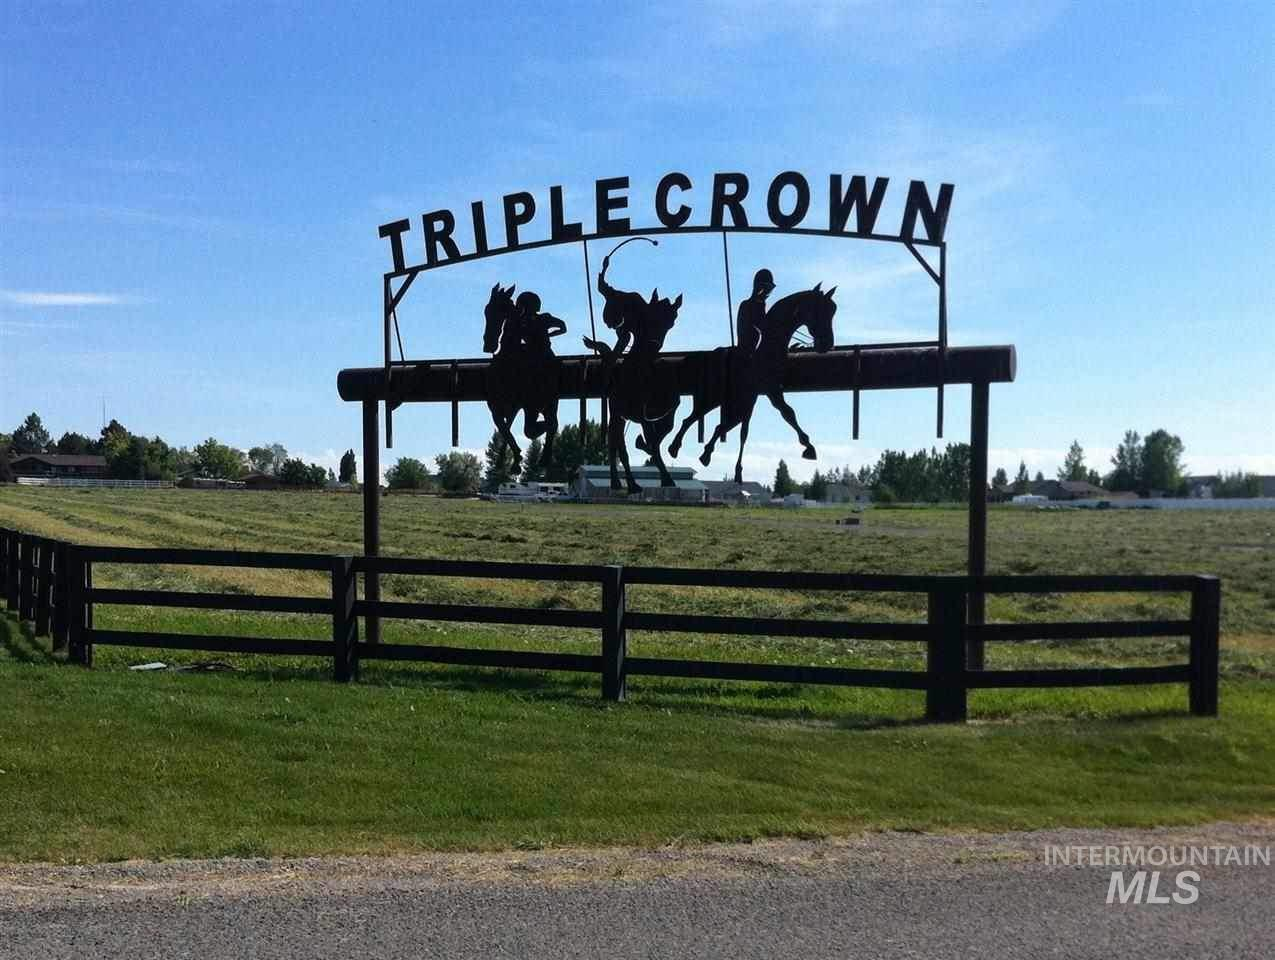 3753 N 2481 E Allie Lane- Twin Falls- Idaho 83301, Land For Sale, Price $59,900, 98598549